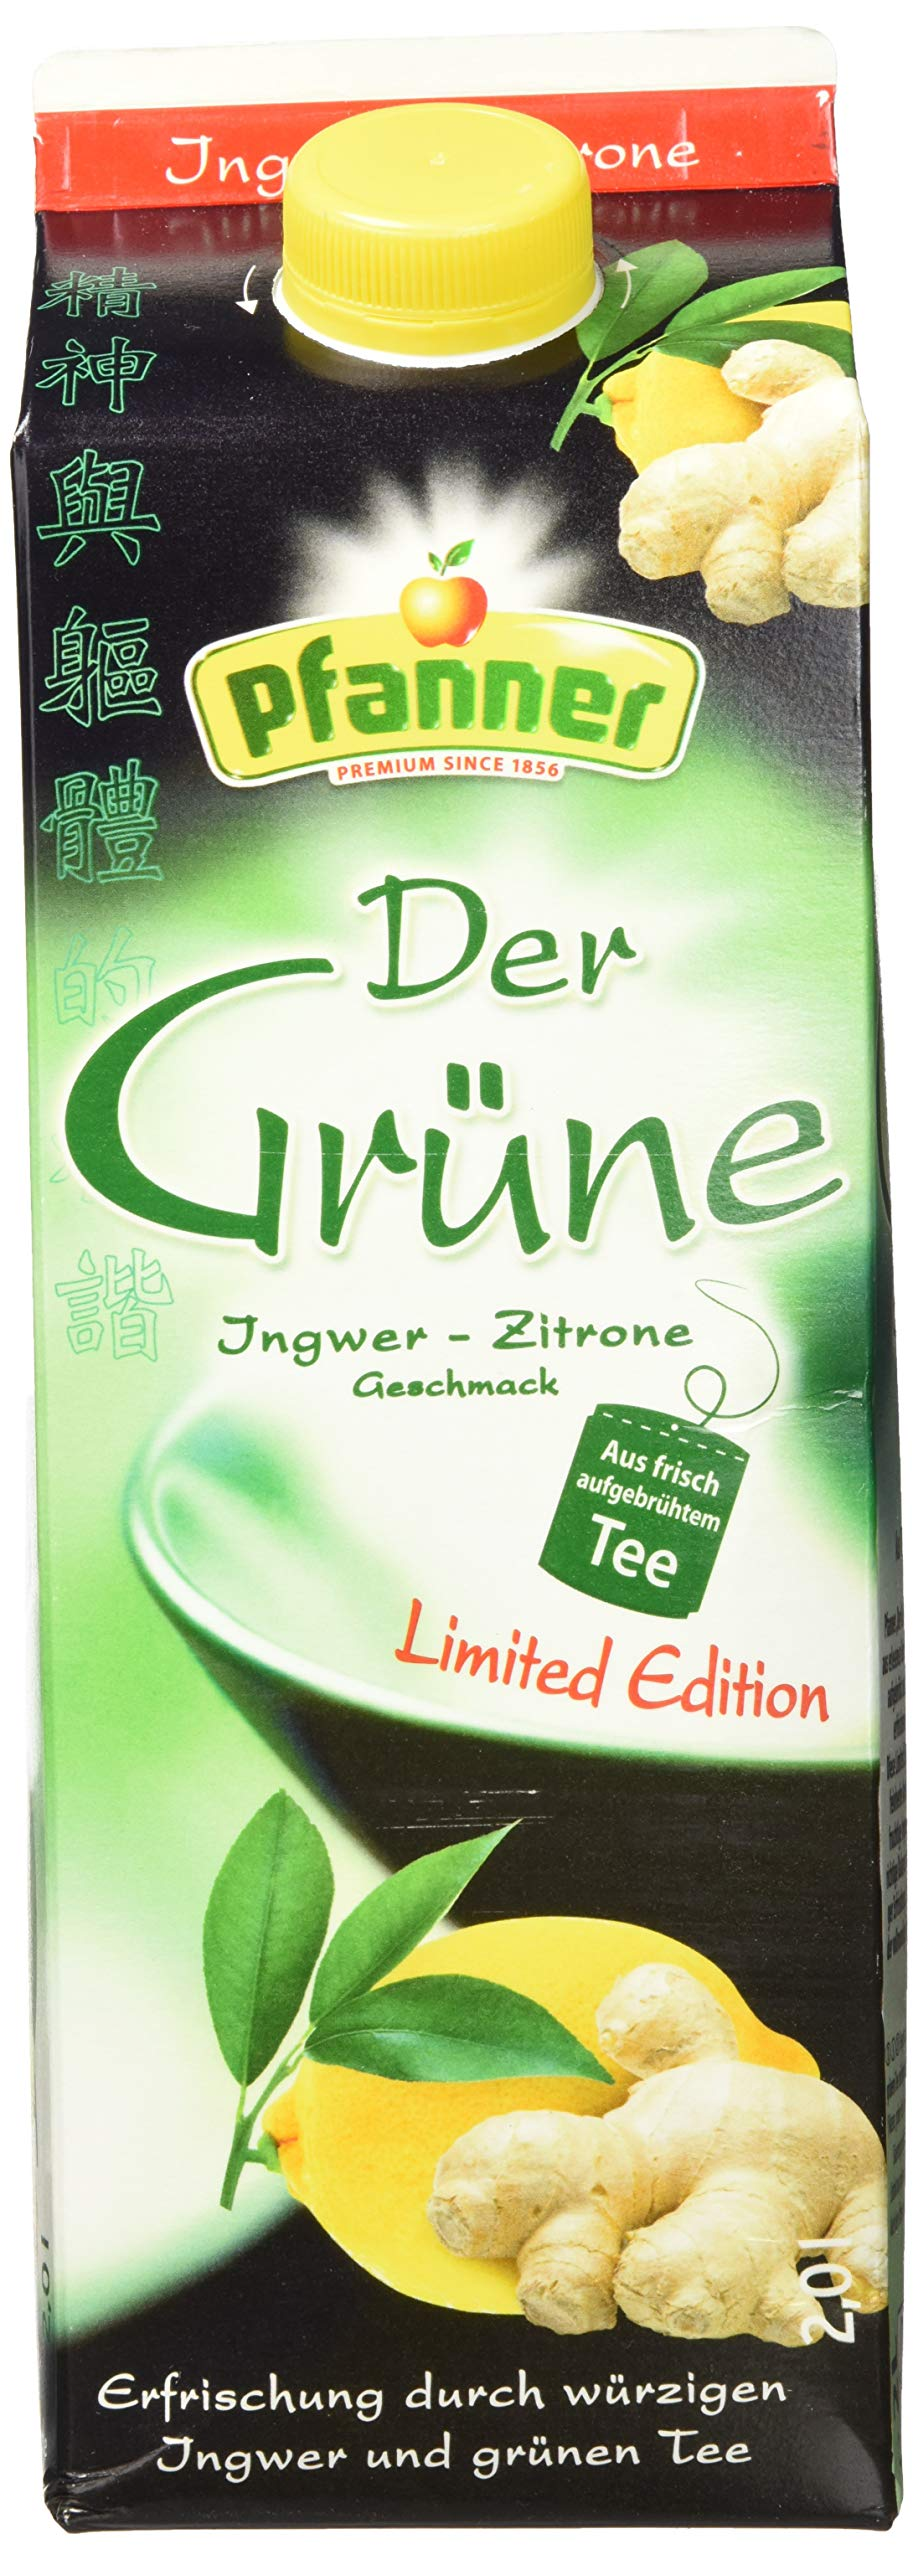 Pfanner-Grner-Tee-Ingwer-Zitrone-6er-Pack-6-x-2l